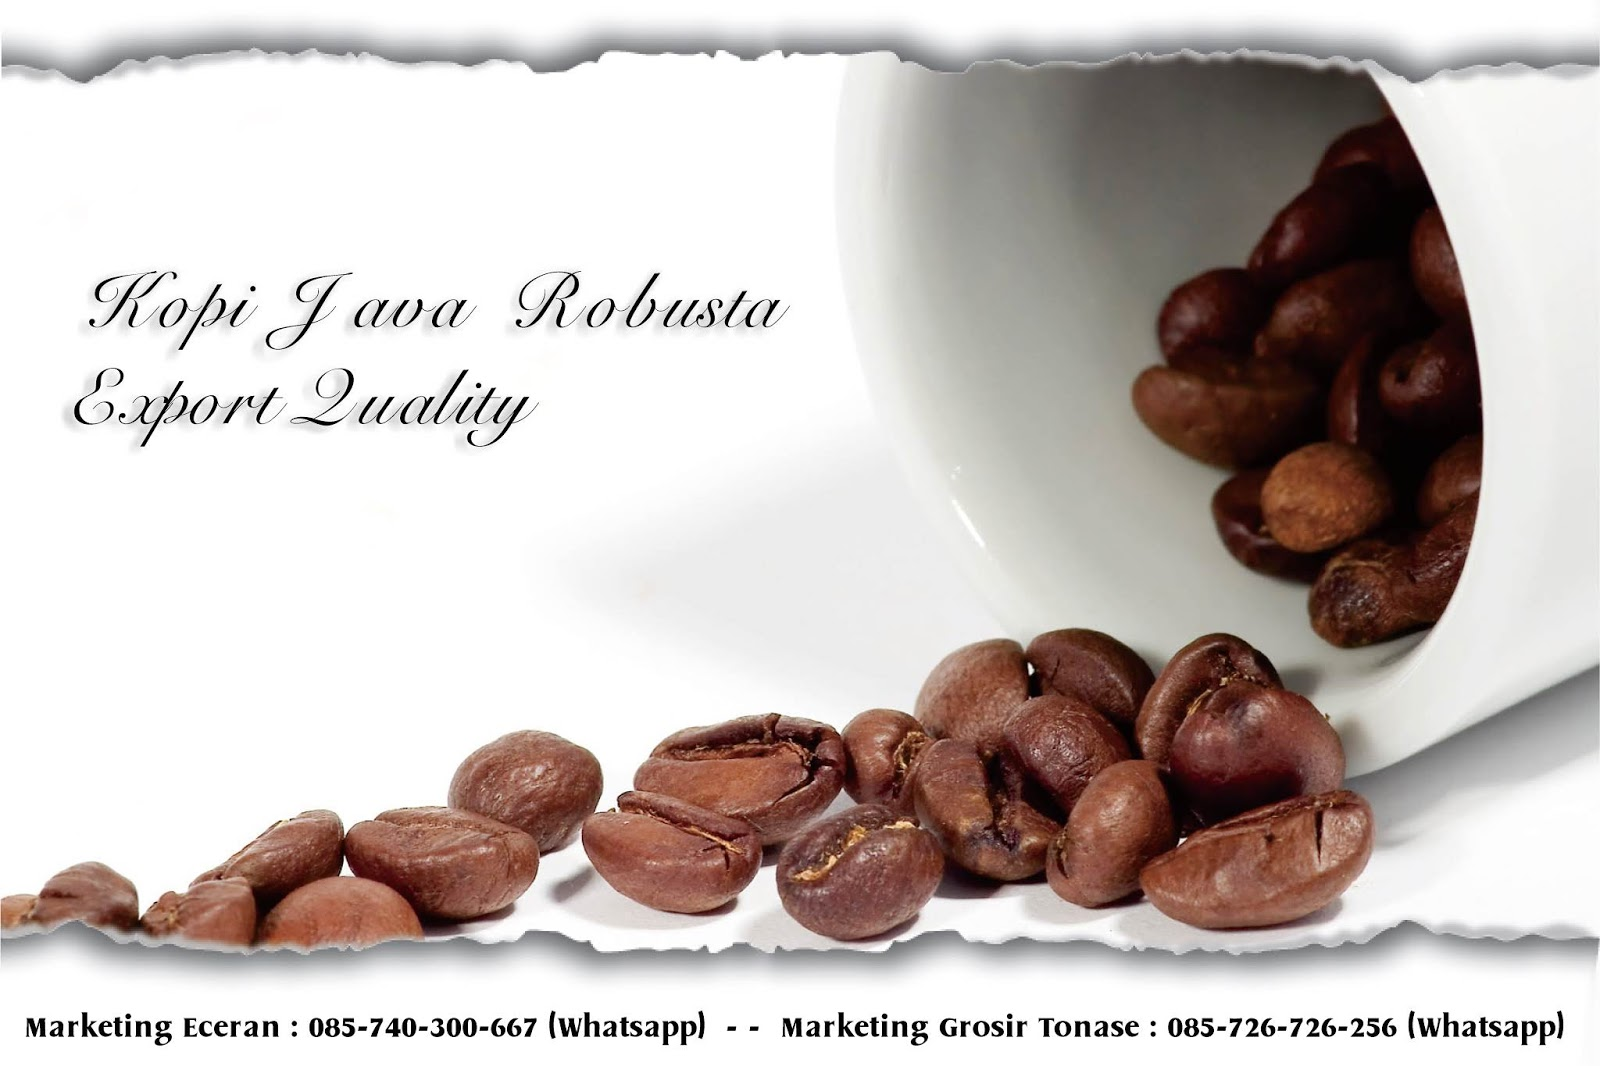 Jual kopi semarang, jual kopi bubuk semarang, jual kopi arabika semarang, jual kopi robusta semarang, grosir kopi semarang, distributor kopi semarang